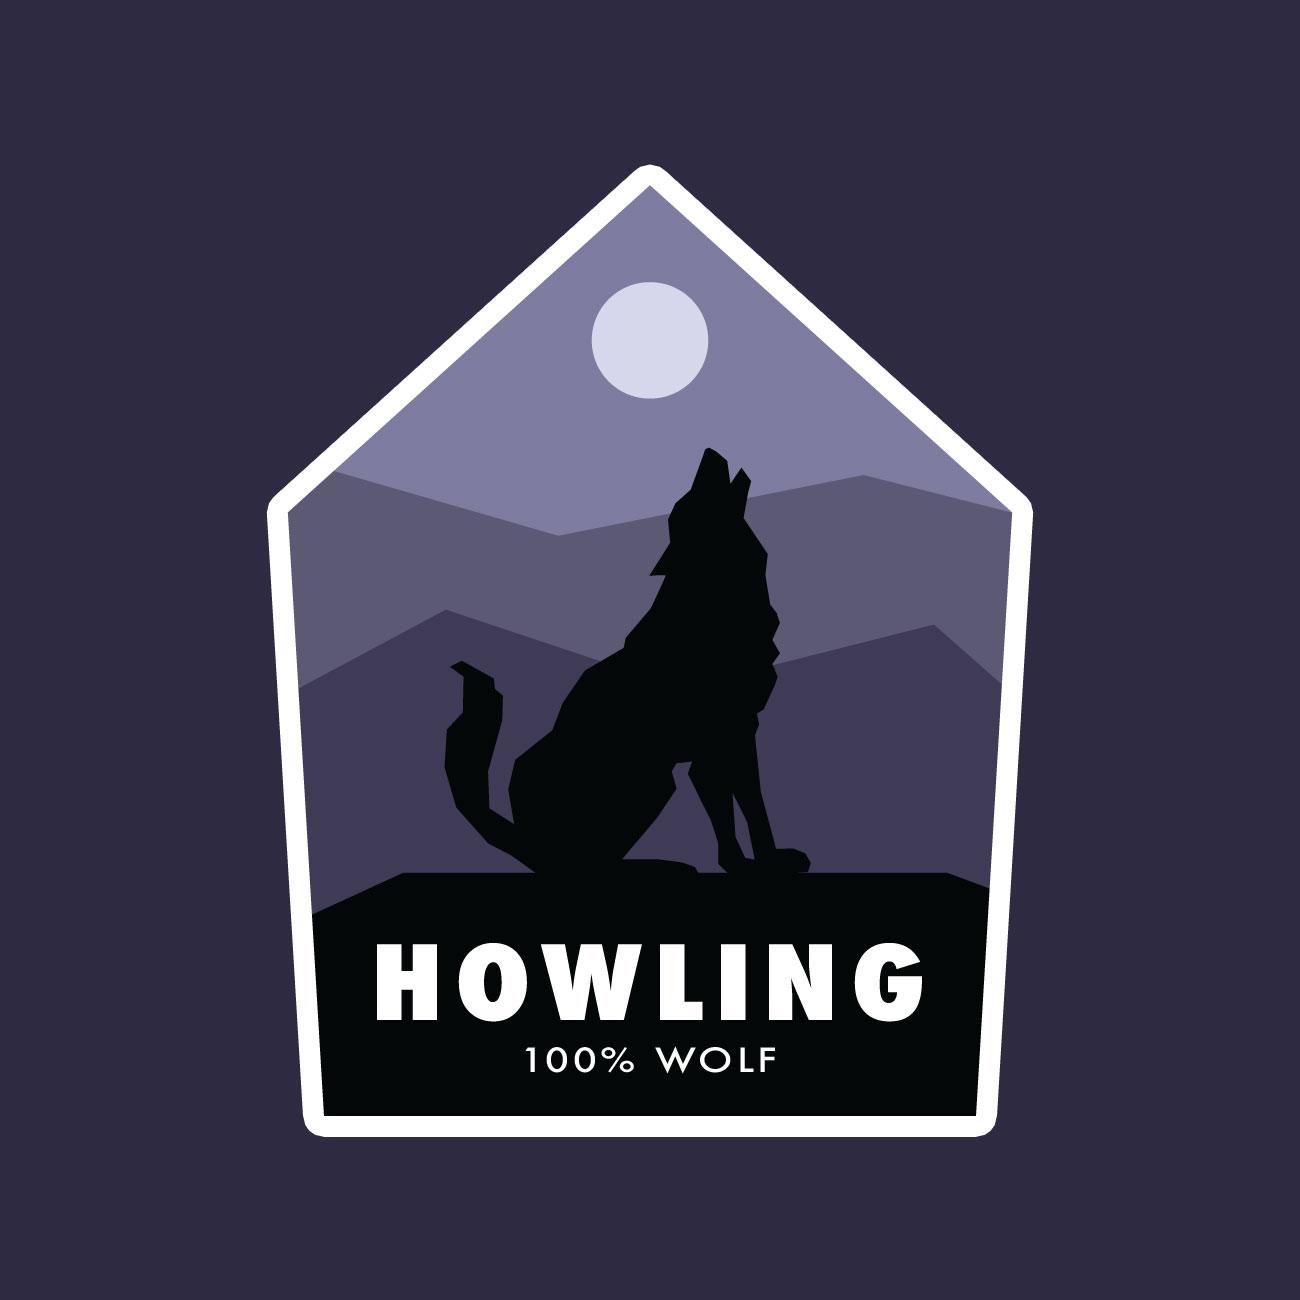 howling-badge